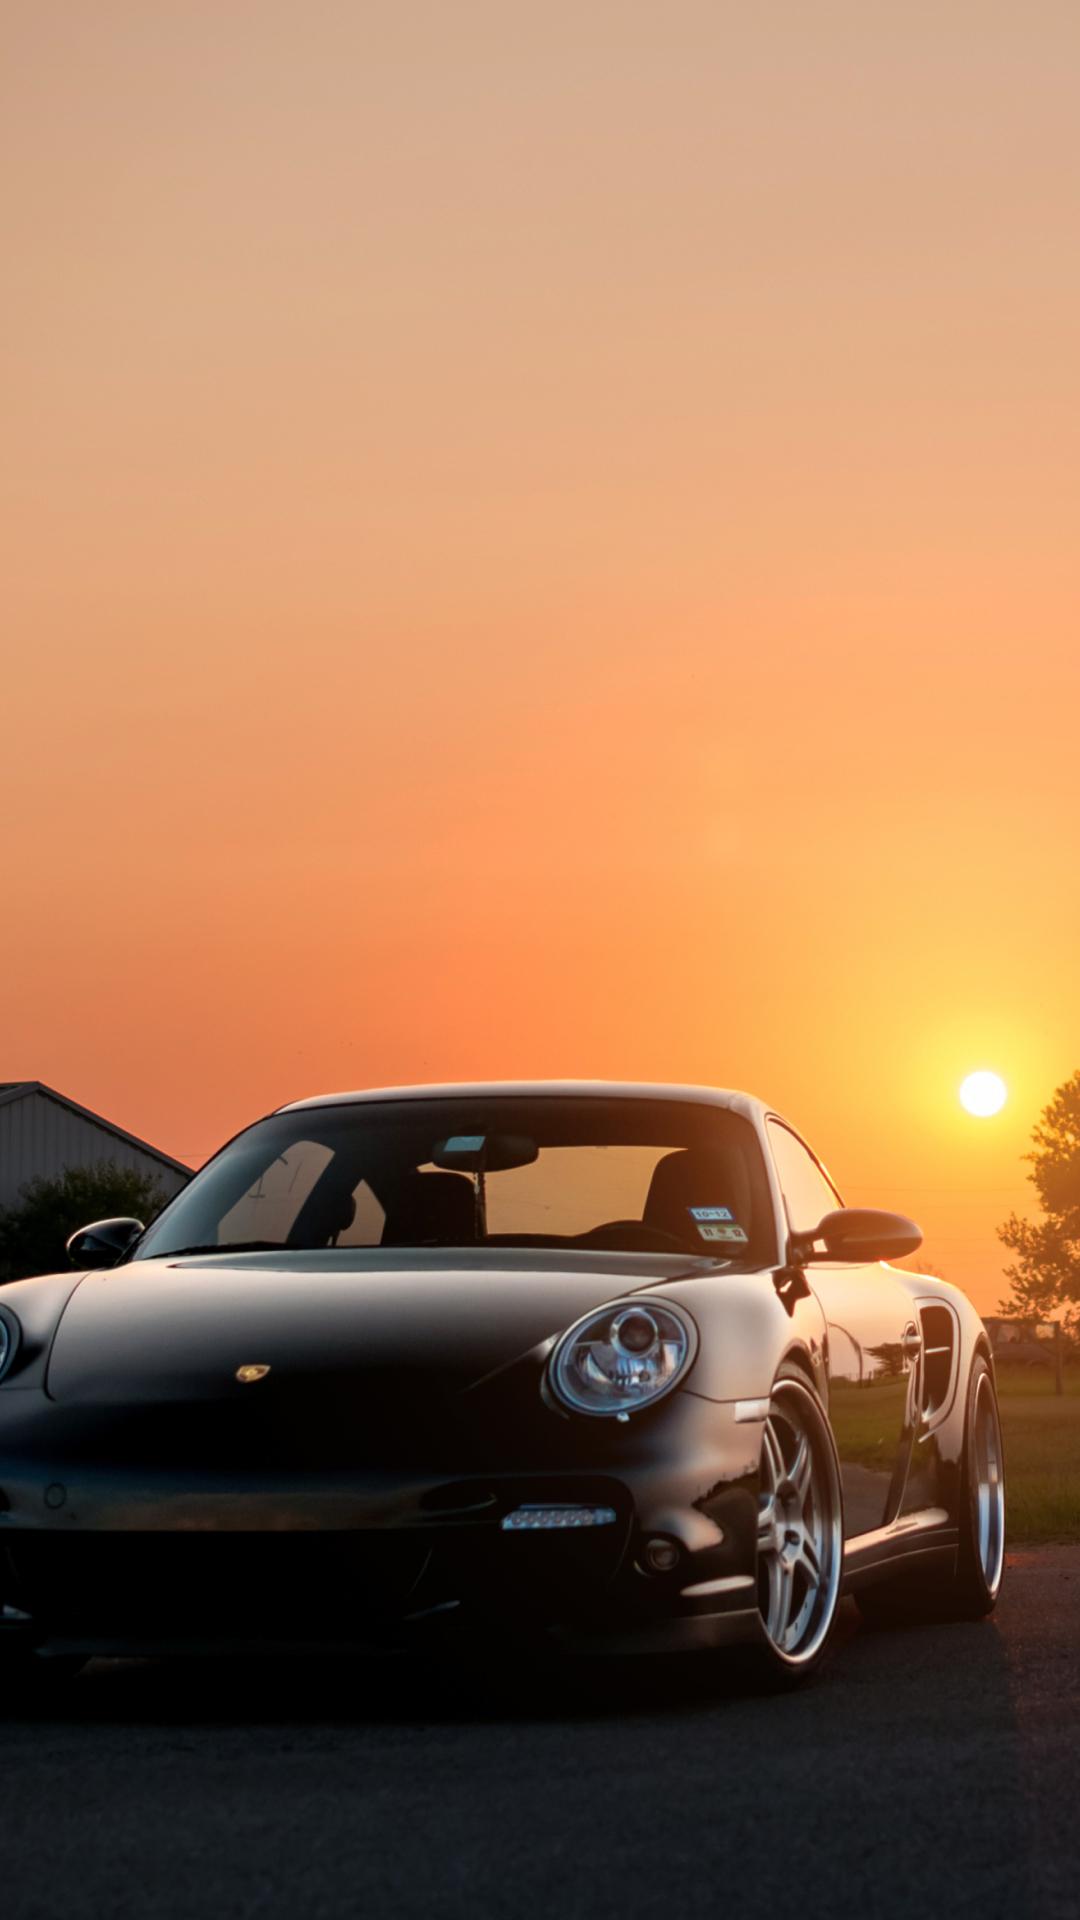 porsche 911 turbo 997 wallpaper for iphone 6 plus - Porsche 911 Turbo Wallpaper Iphone